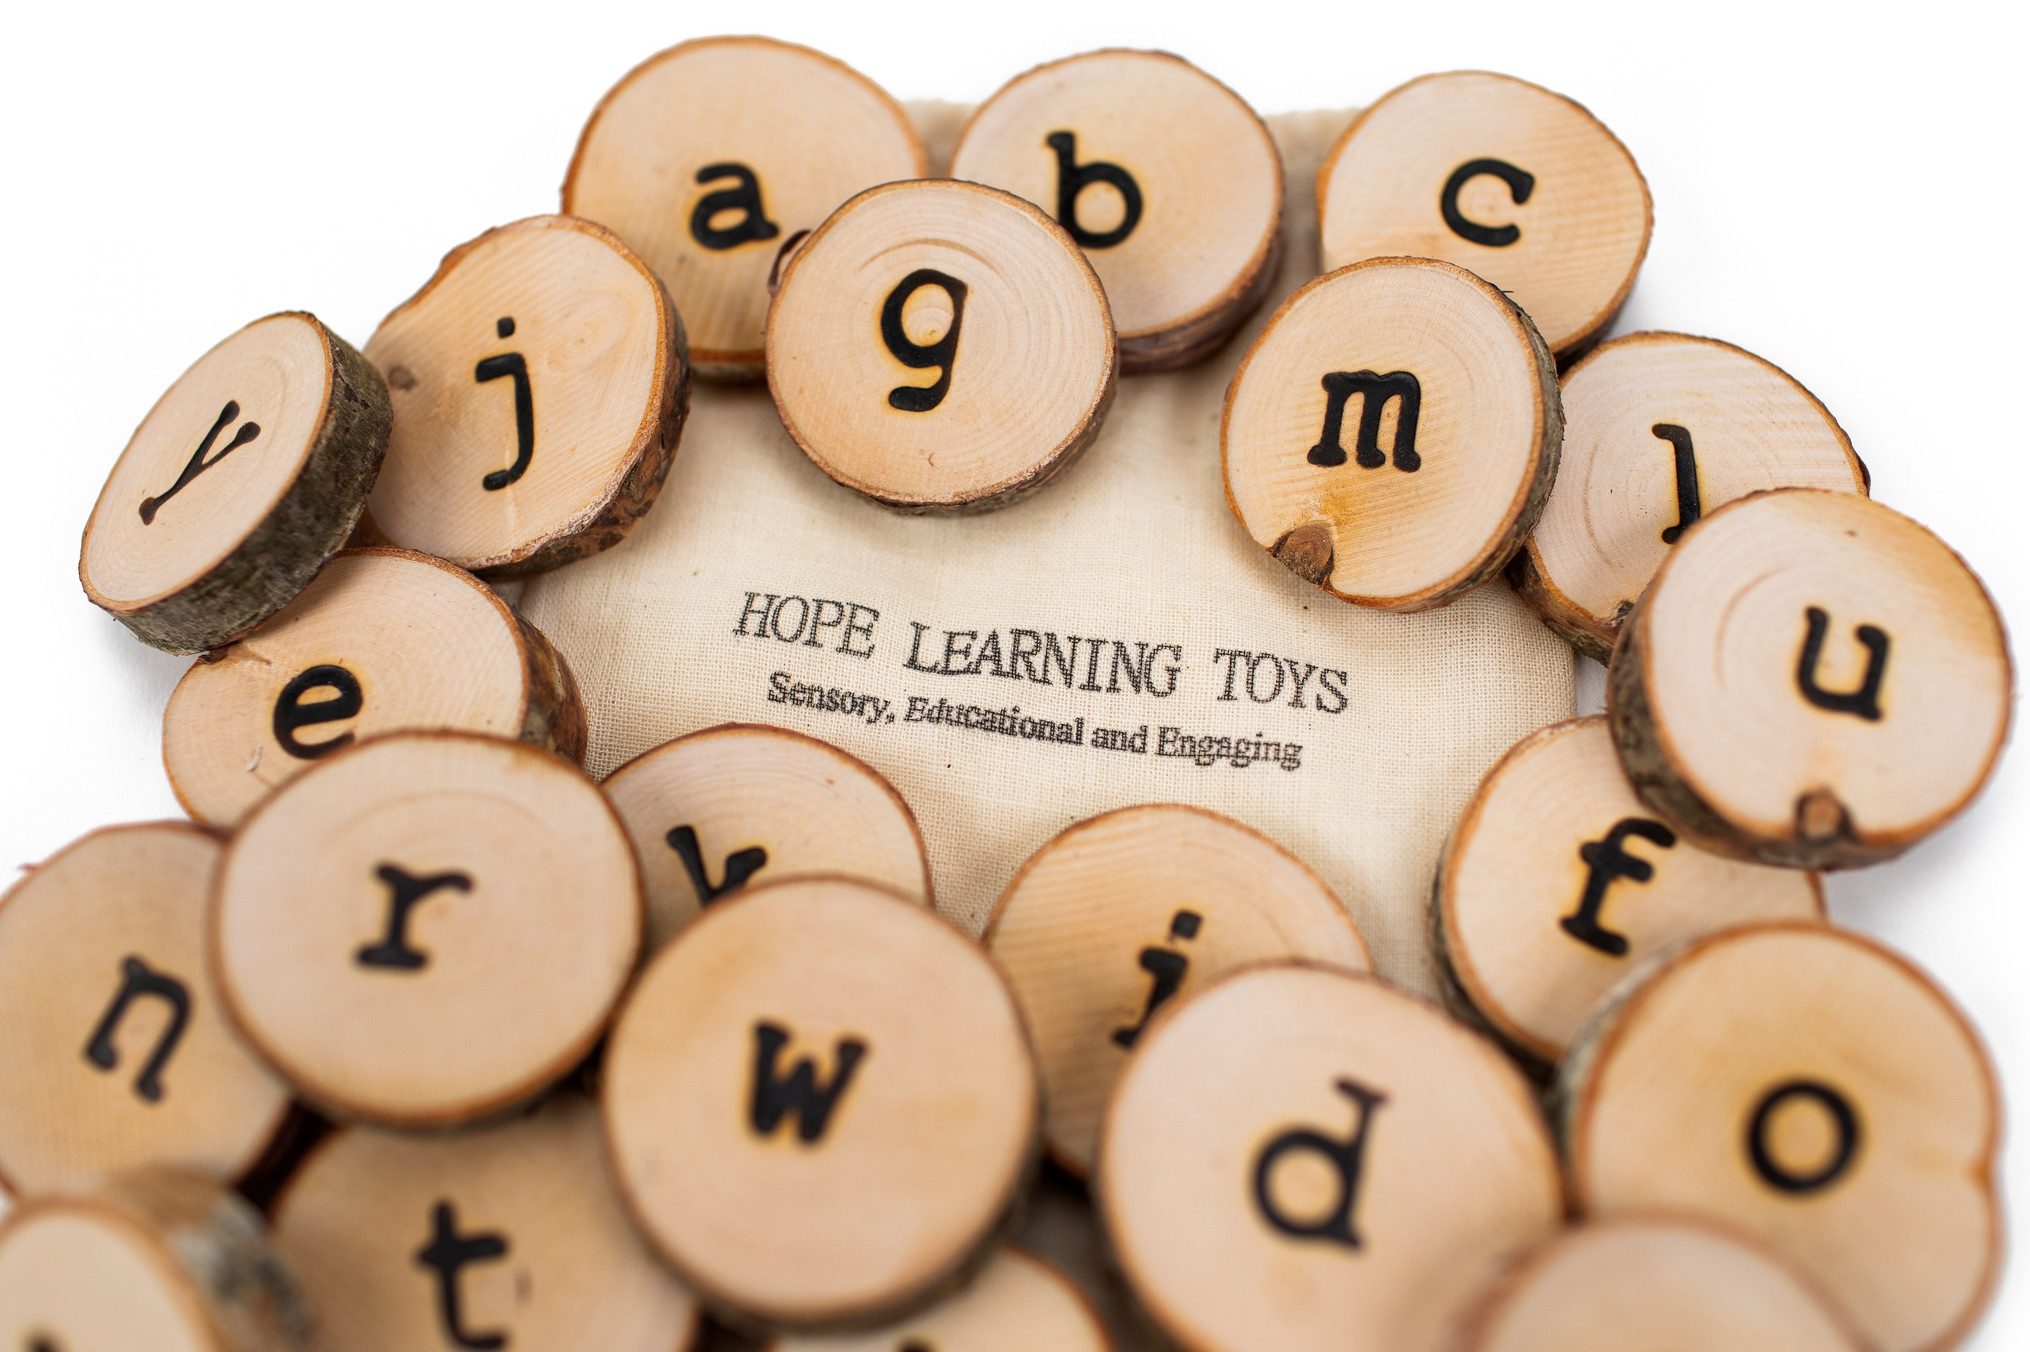 Hope Learning Toys